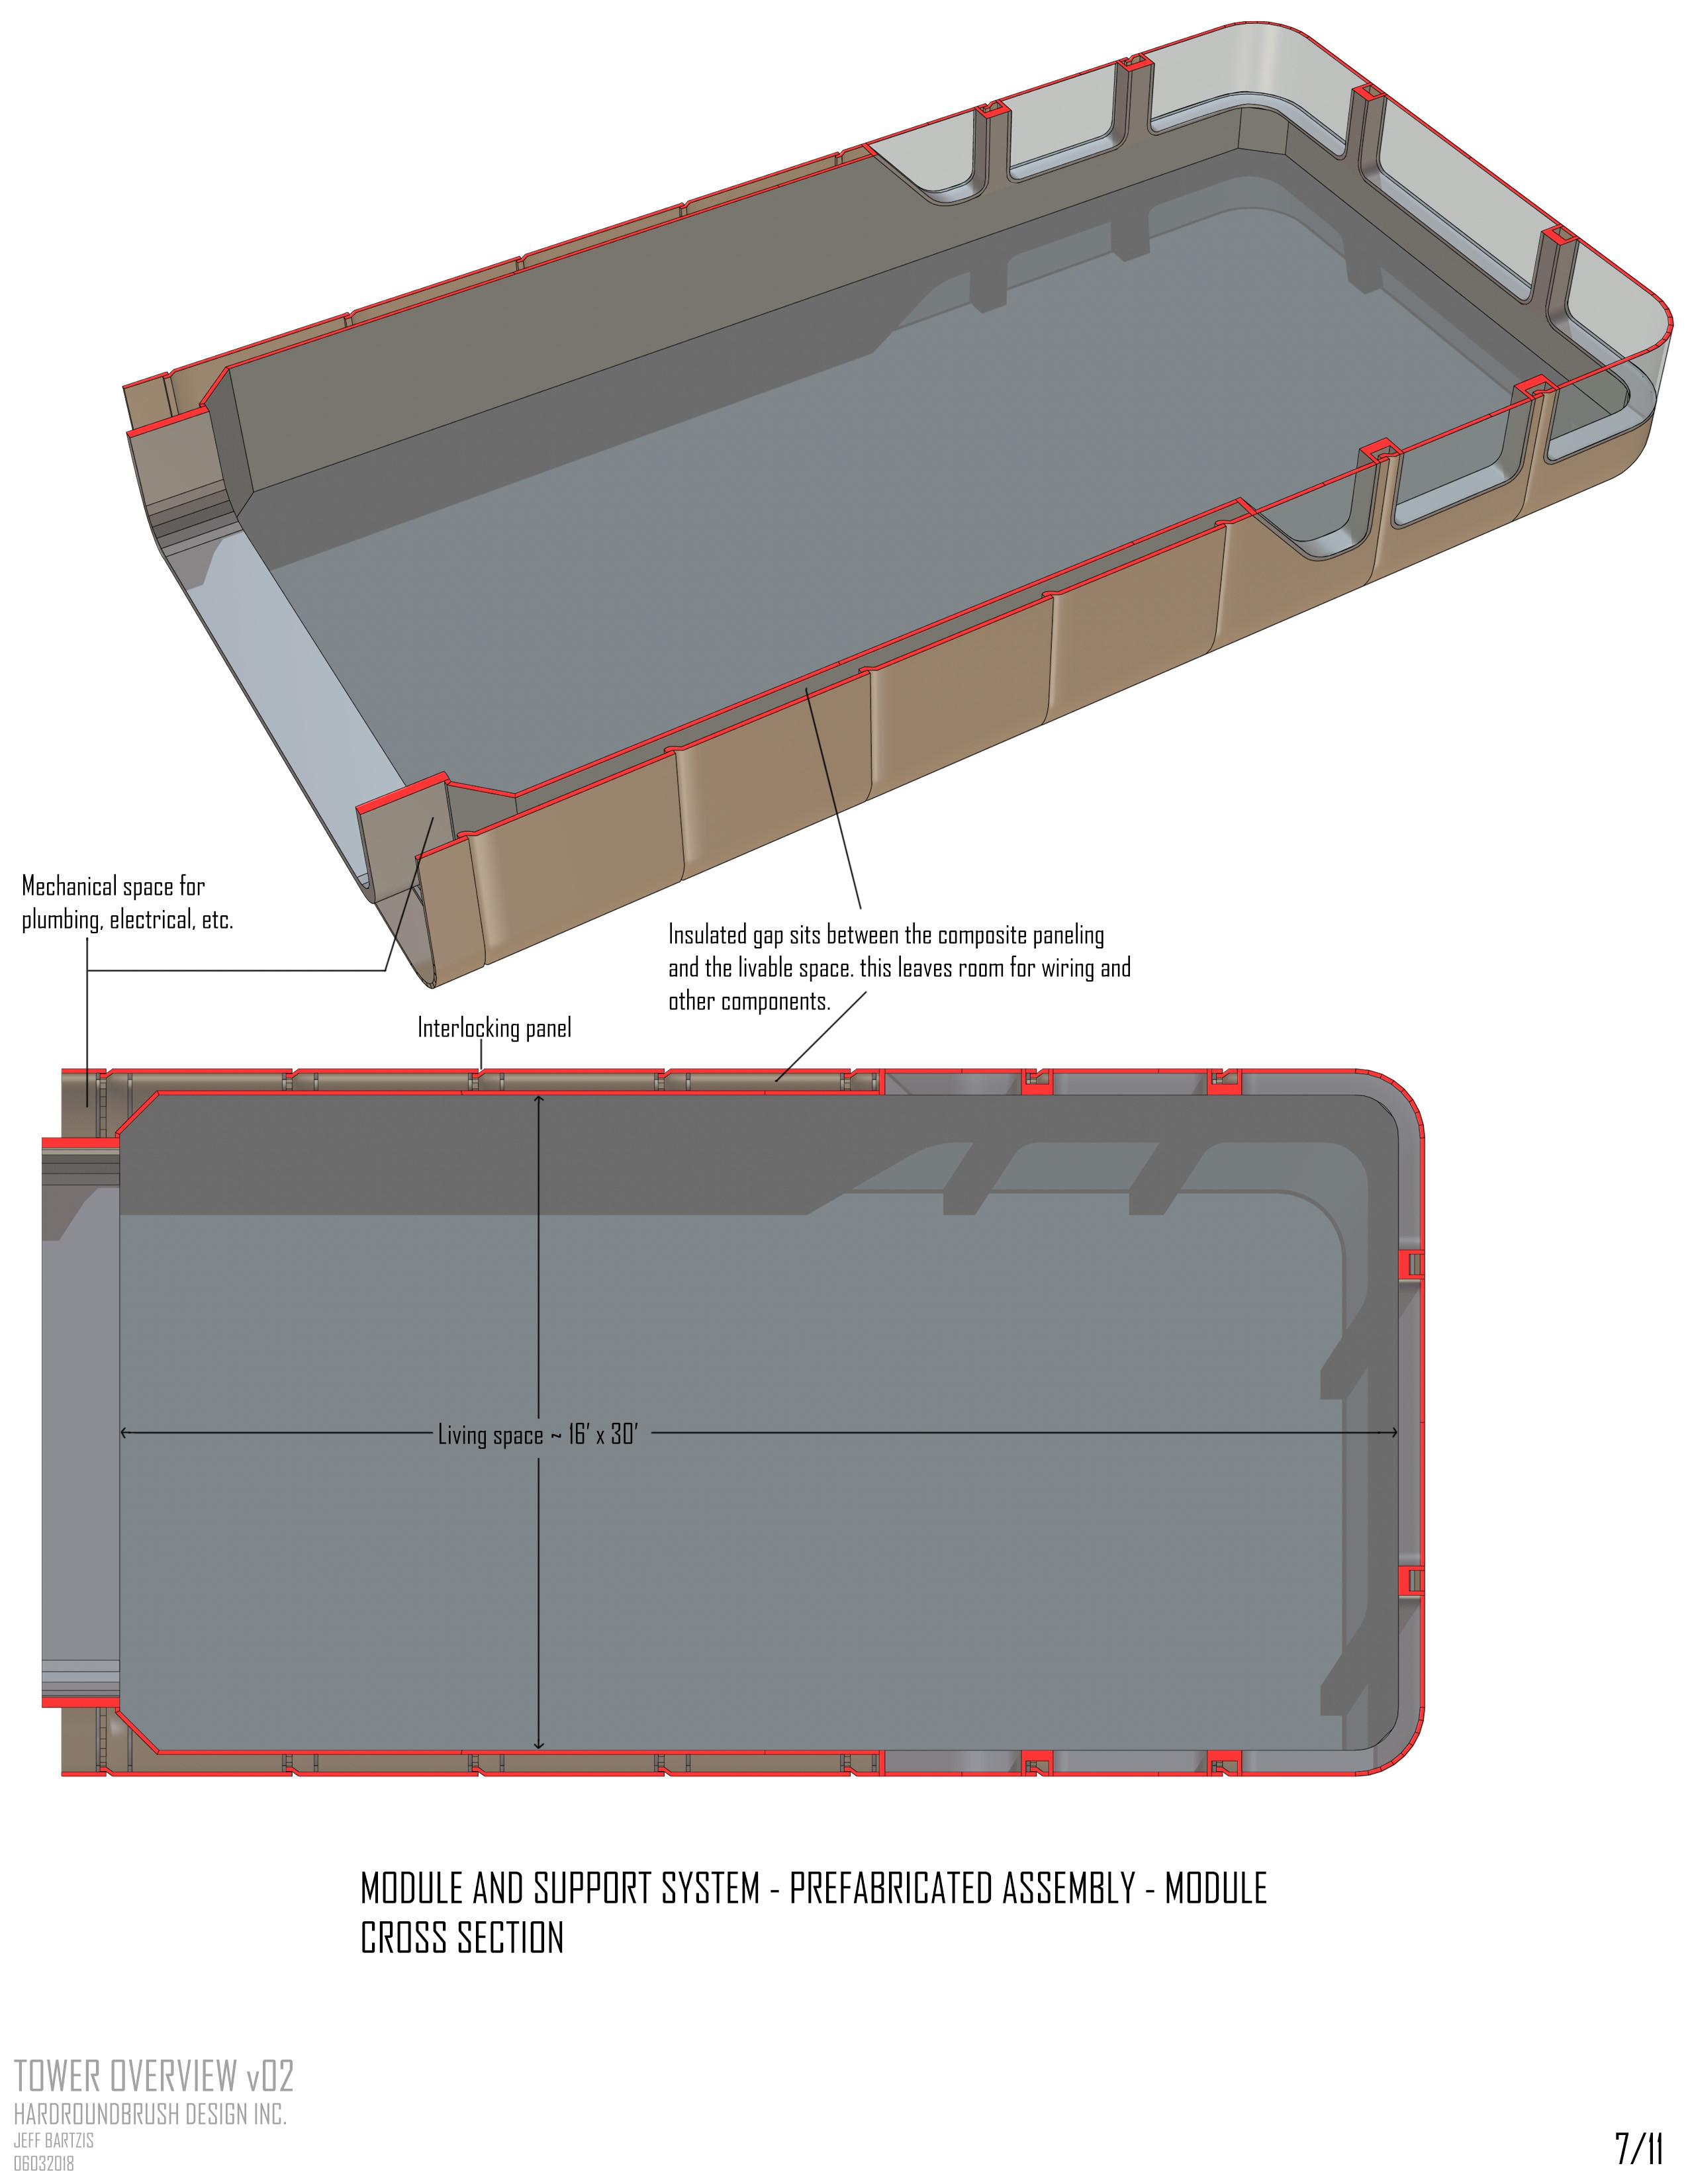 Module cross section diagram